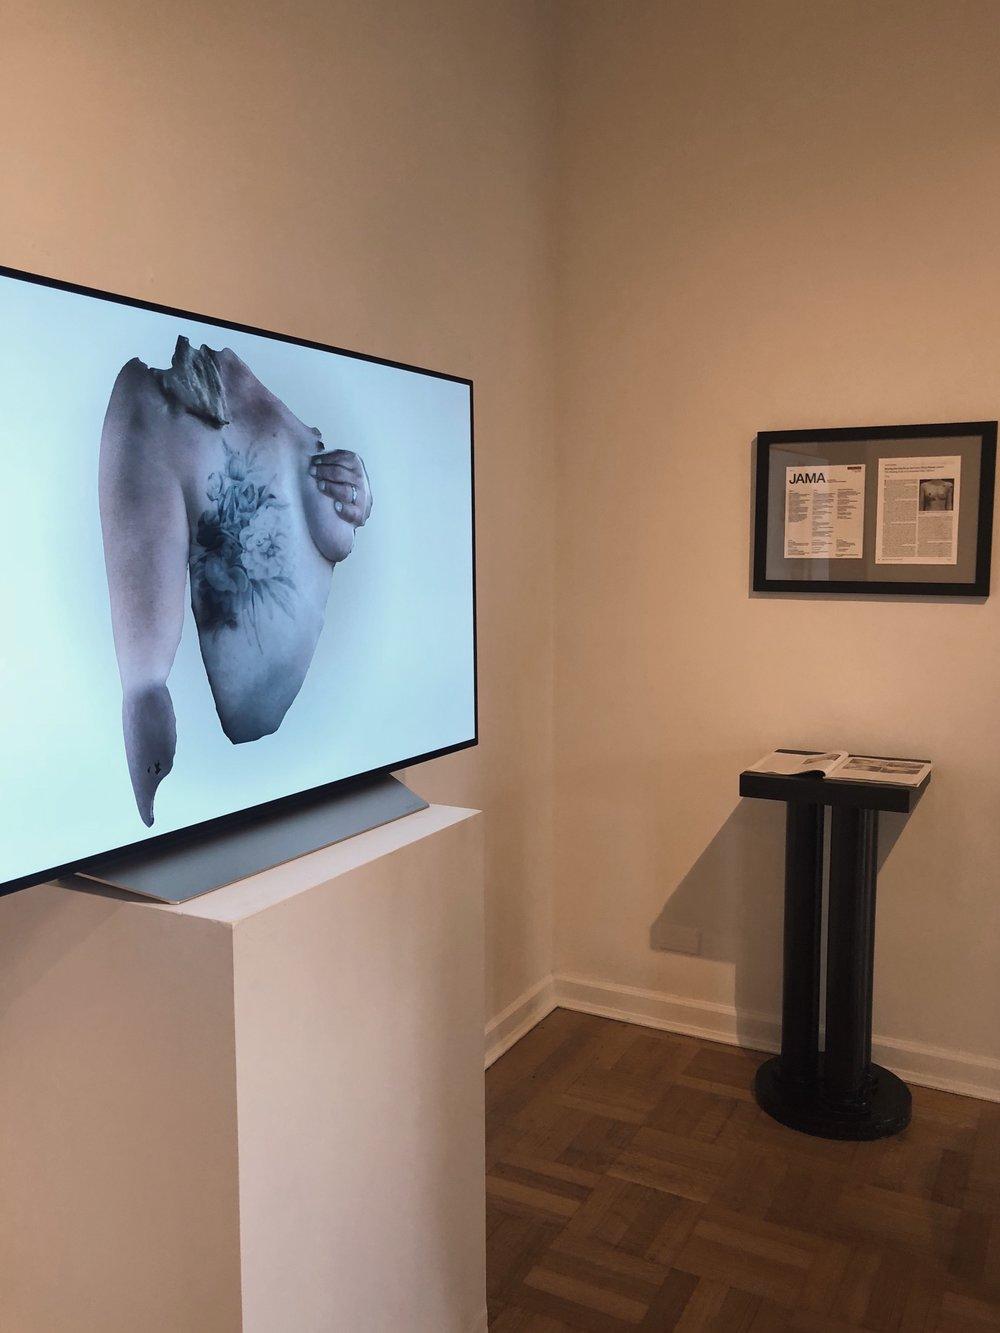 Mastectomy Tattoos and Post-Surgery Healing